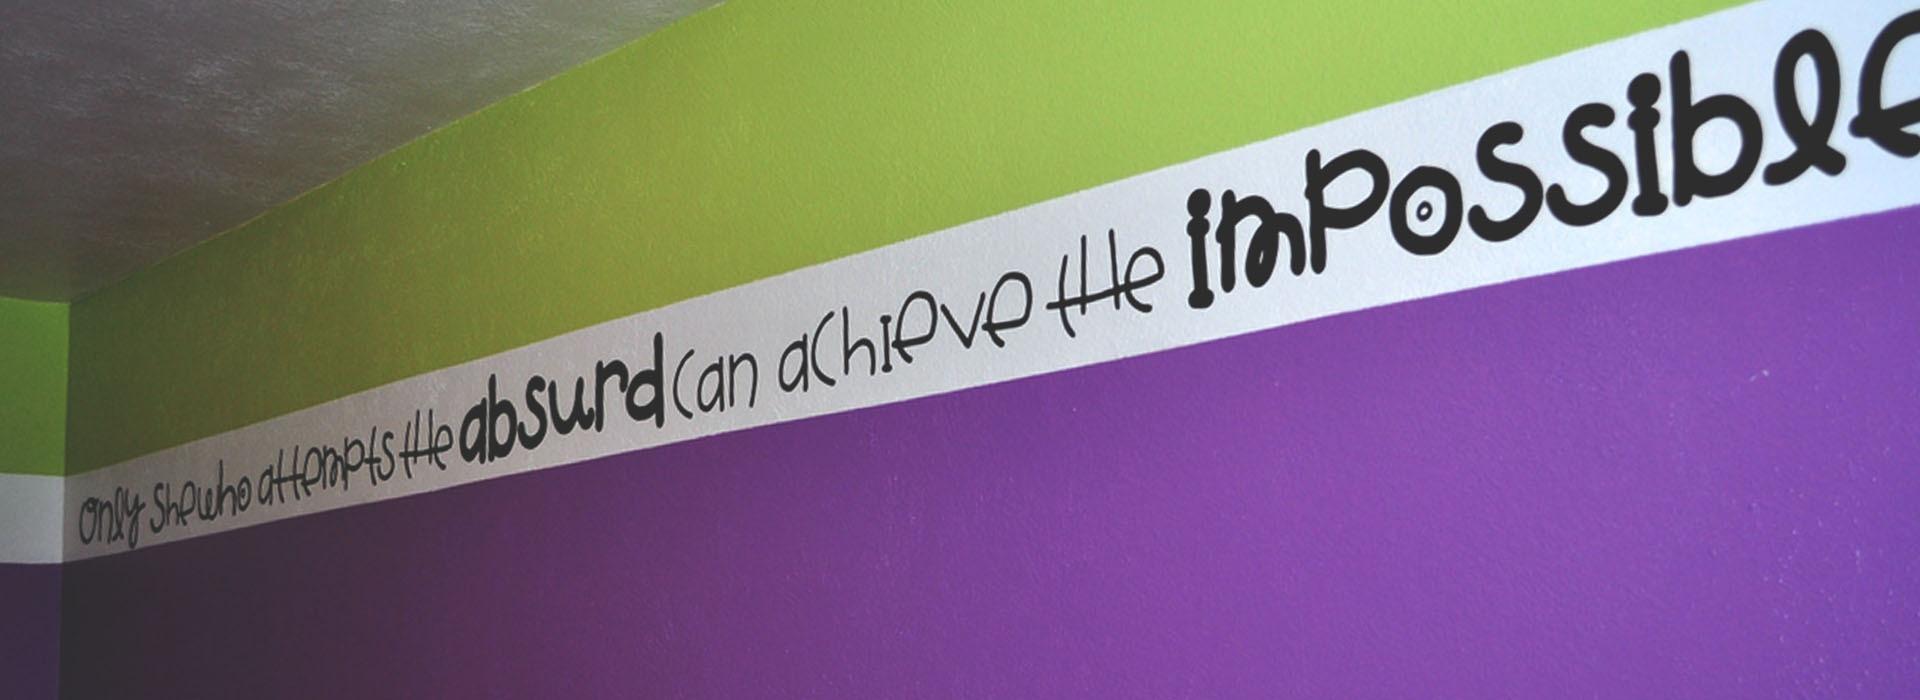 vinyl lettering for walls